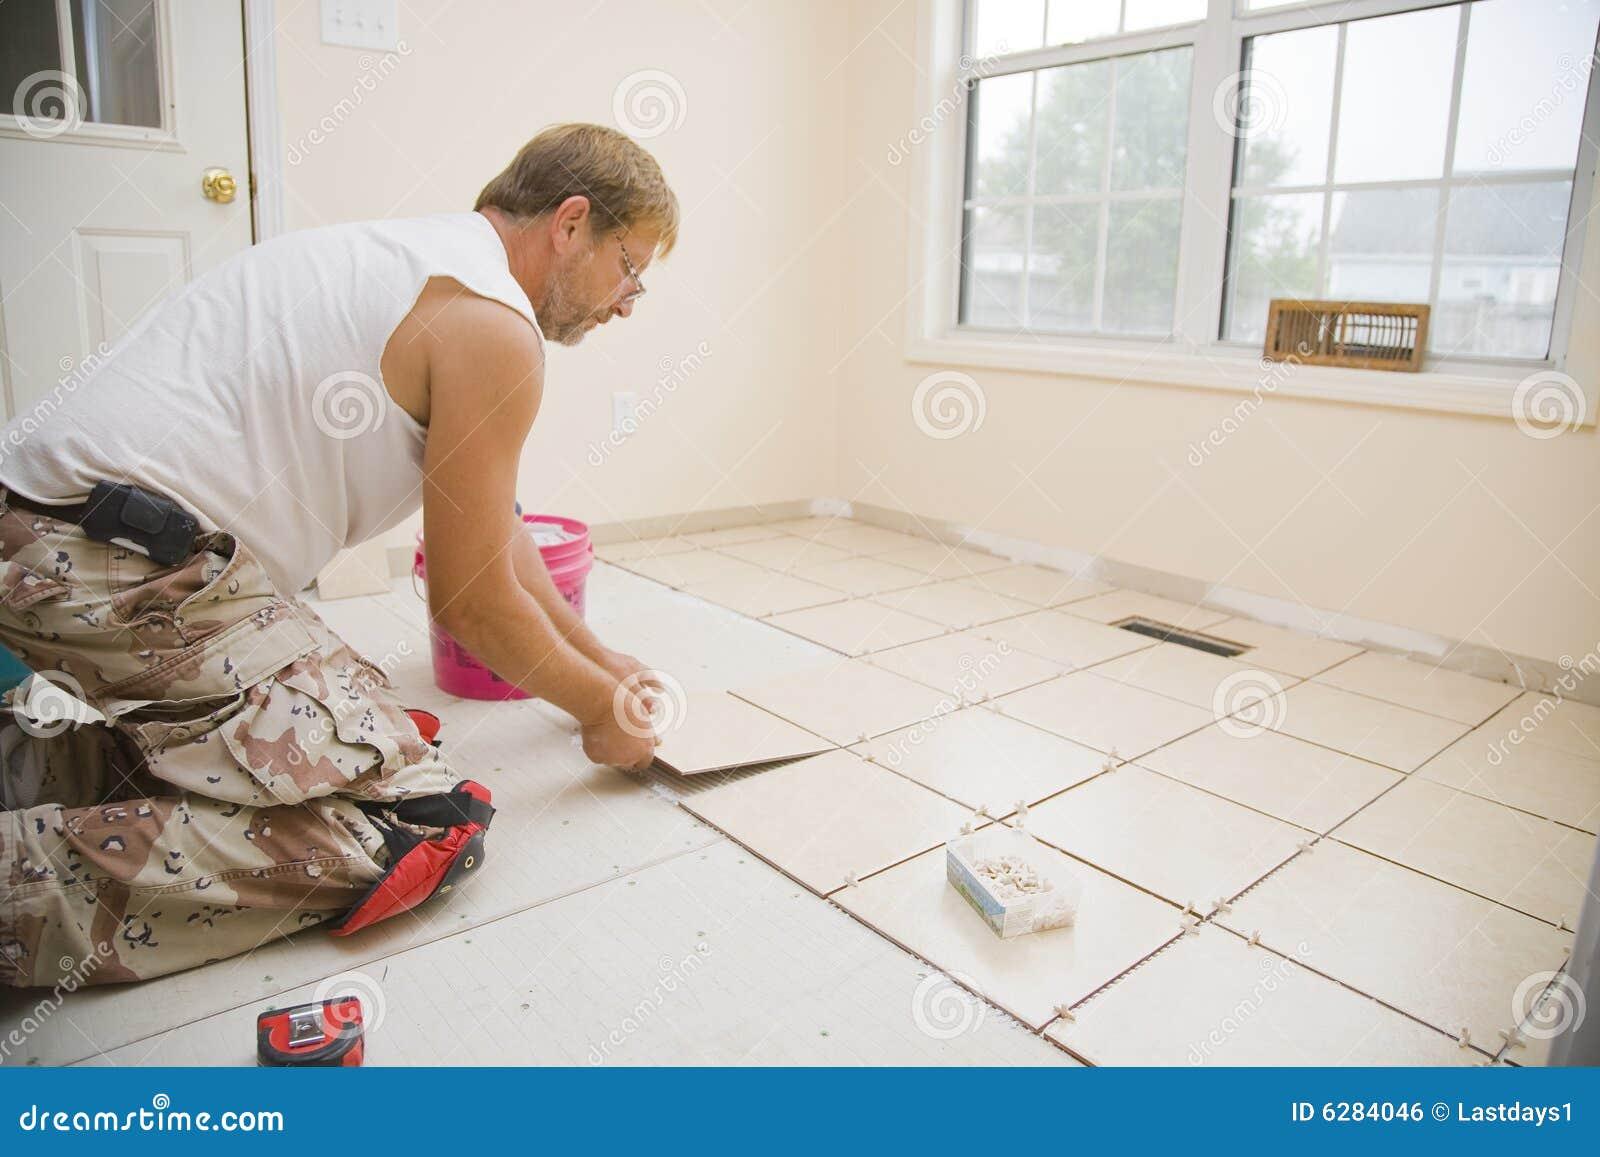 Ceramic tile installer stock photo image of straight 6284046 ceramic tile installer straight contractor dailygadgetfo Images